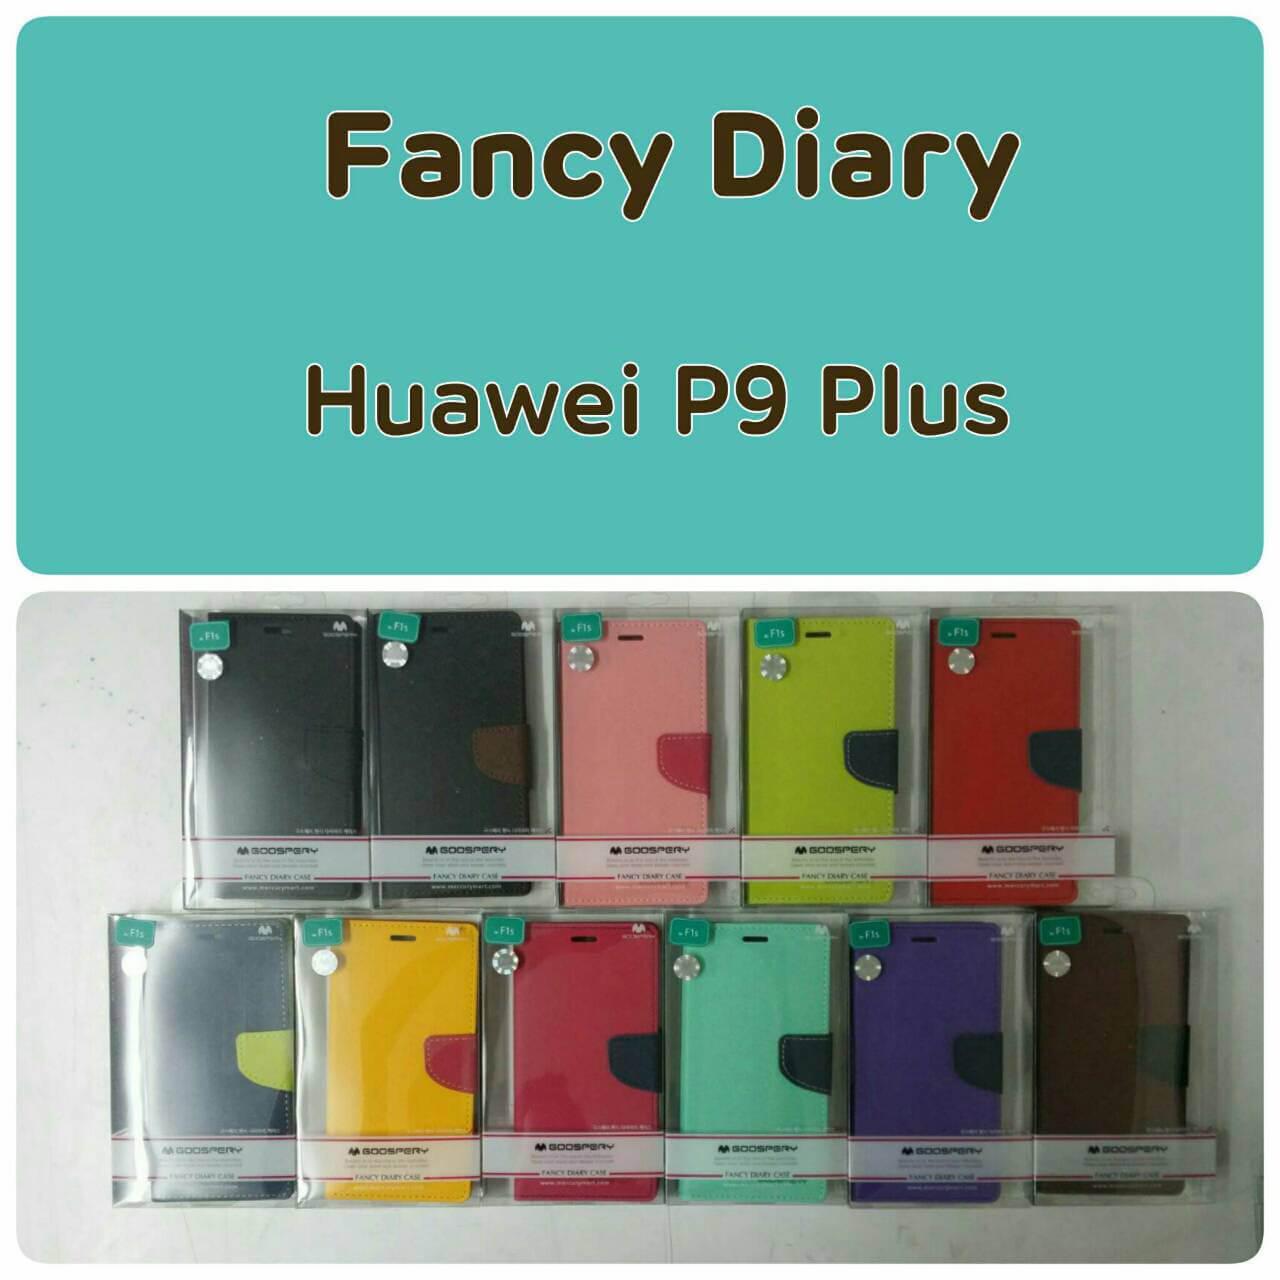 Huawei P9 Plus - เคสฝาพับ Mercury Goospery Fancy Leather Case cover แท้